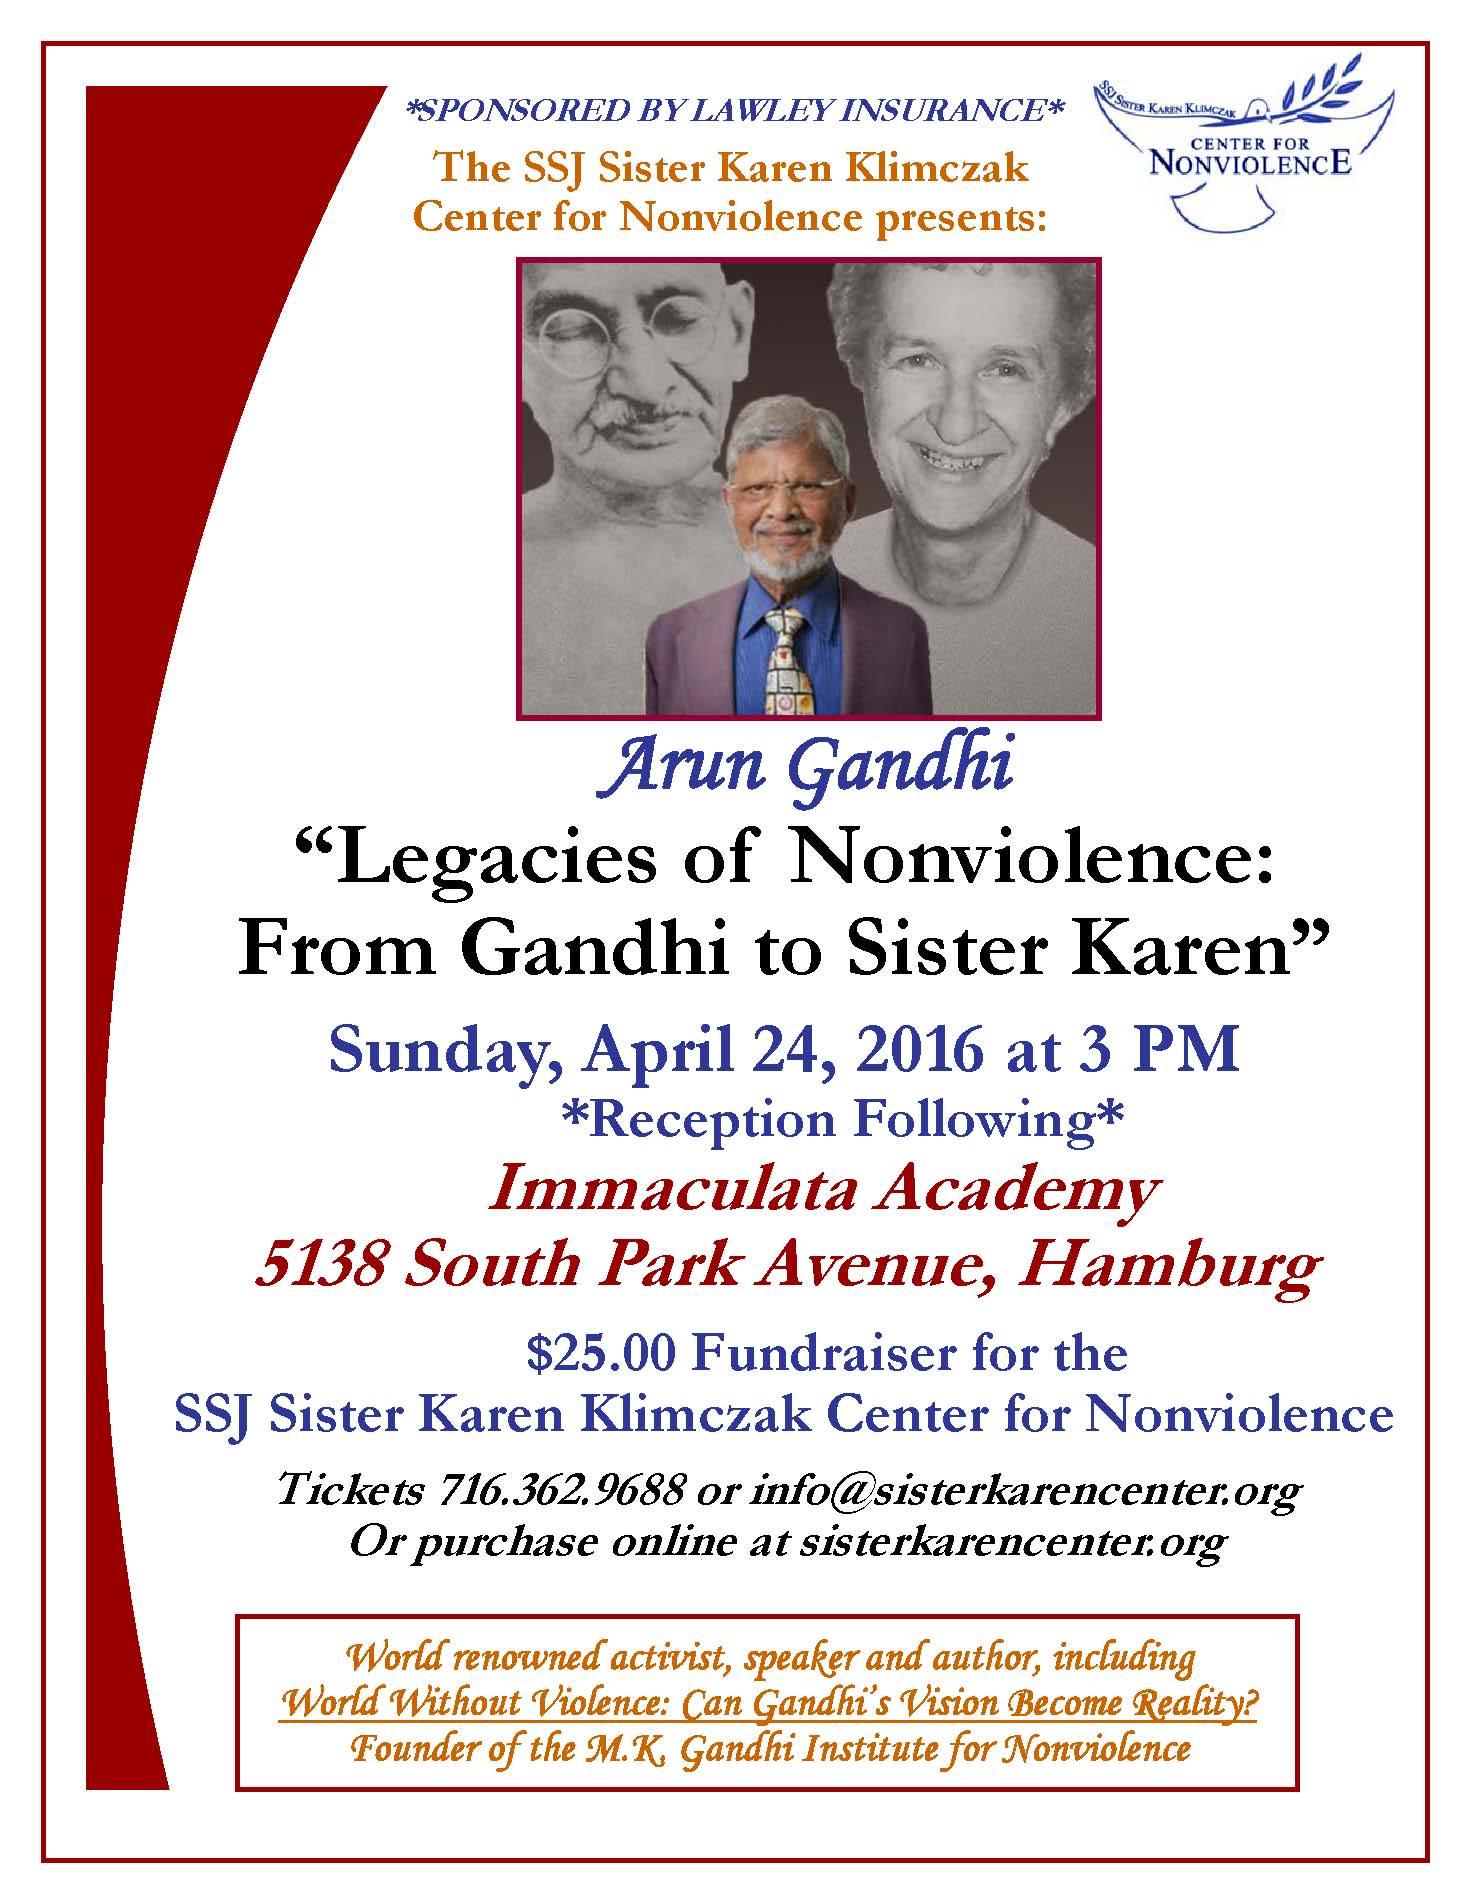 Arun Gandhi flyer.jpg